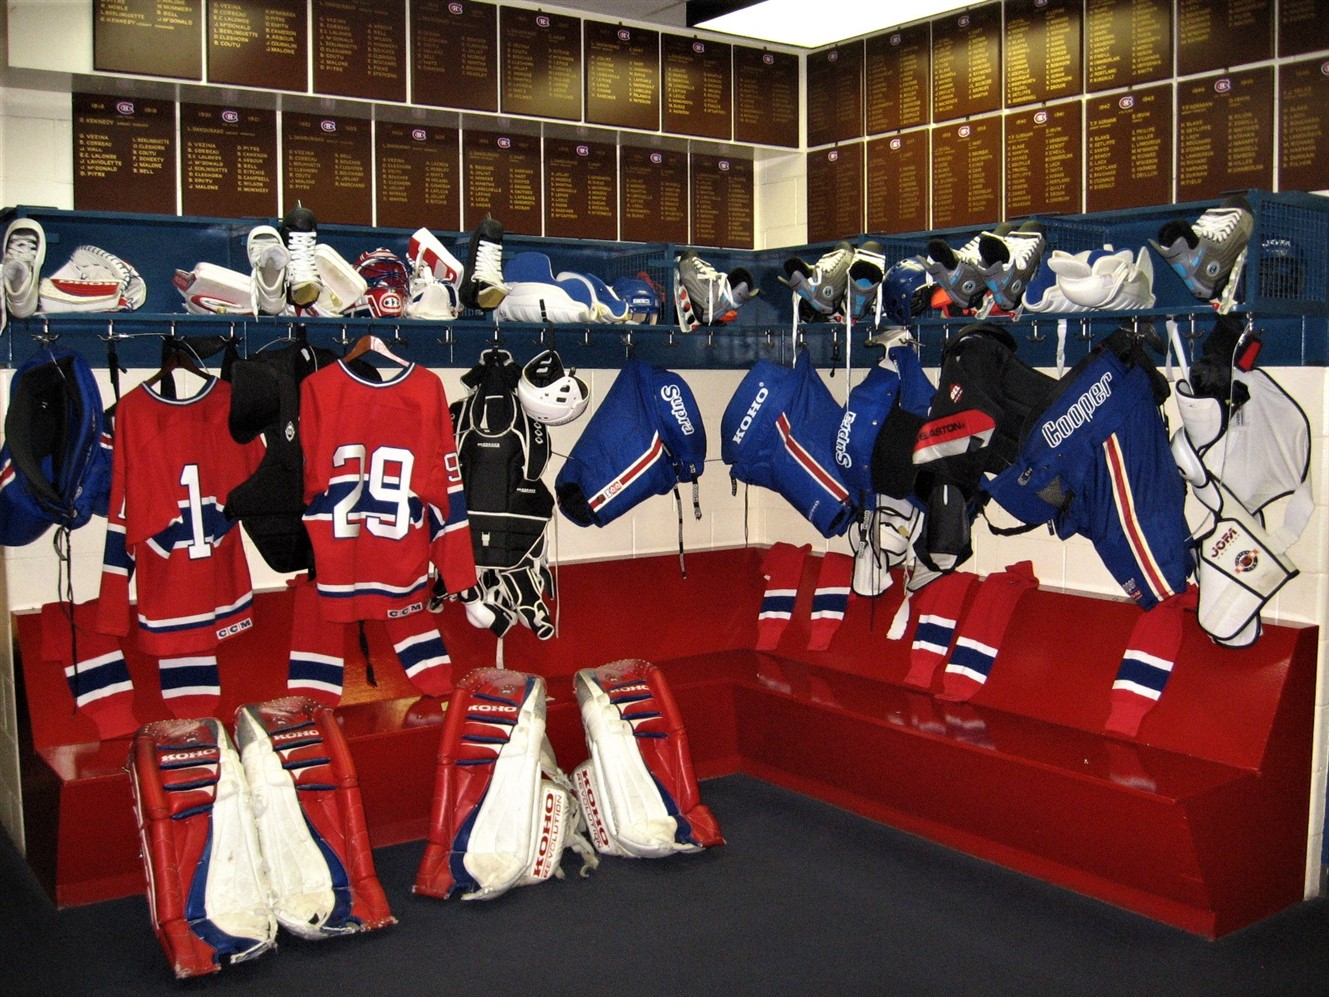 2008 07 05 108 Toronto Hockey Hall of Fame.jpg